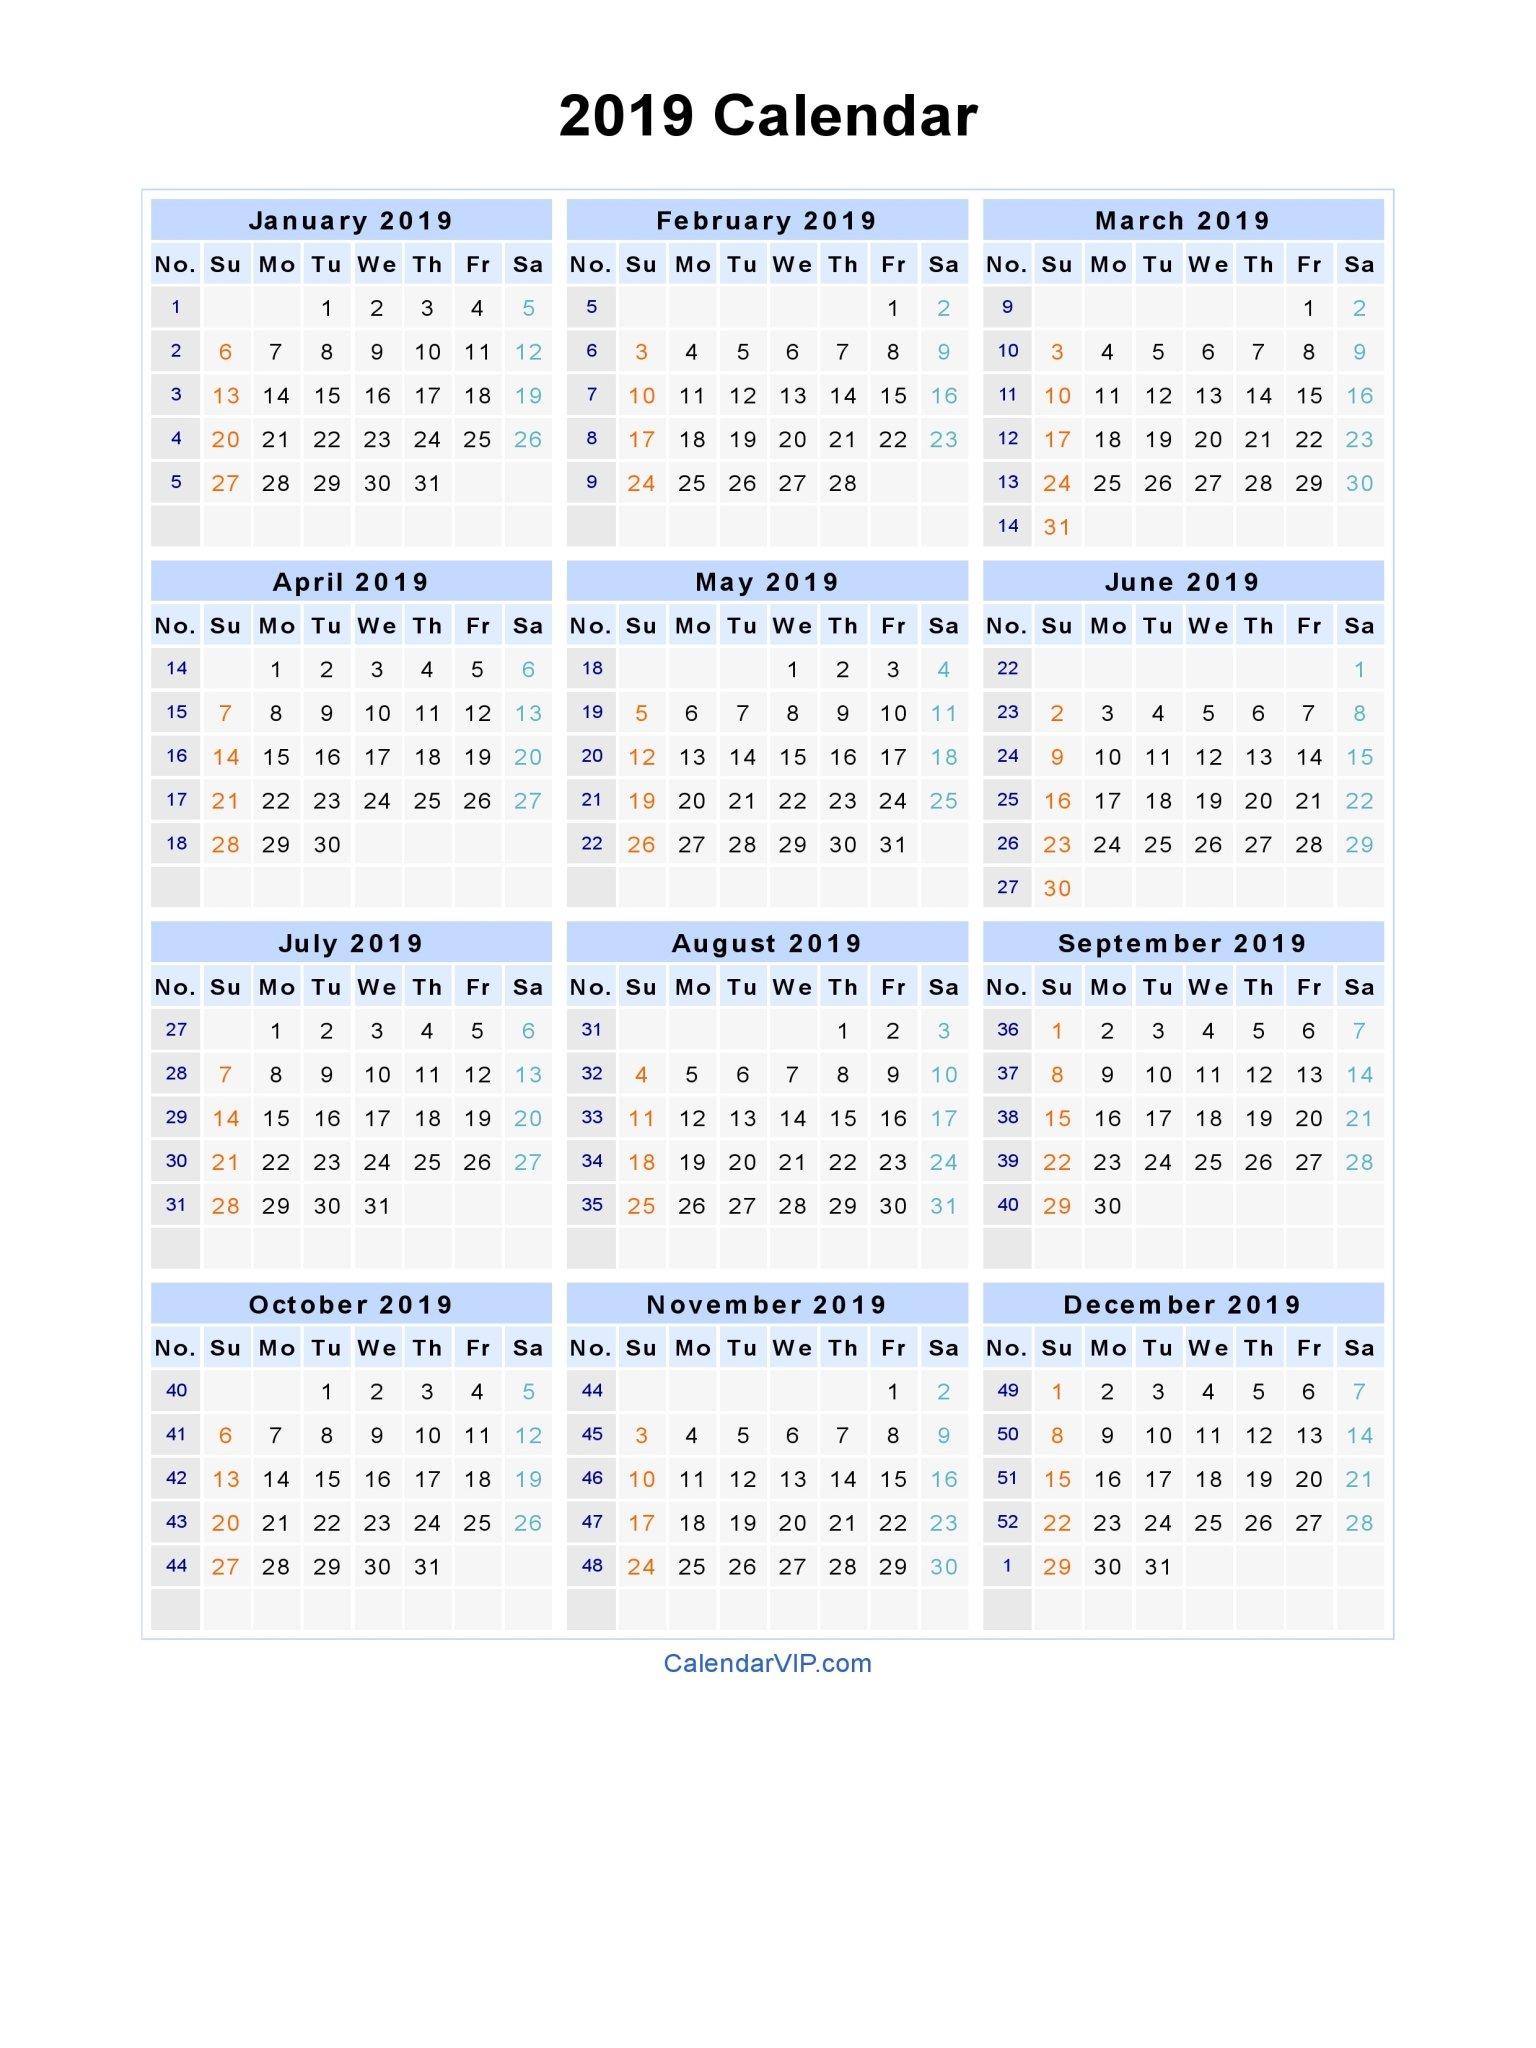 2019 Calendar – Blank Printable Calendar Template In Pdf Word Excel Calendar 2019 Microsoft Word